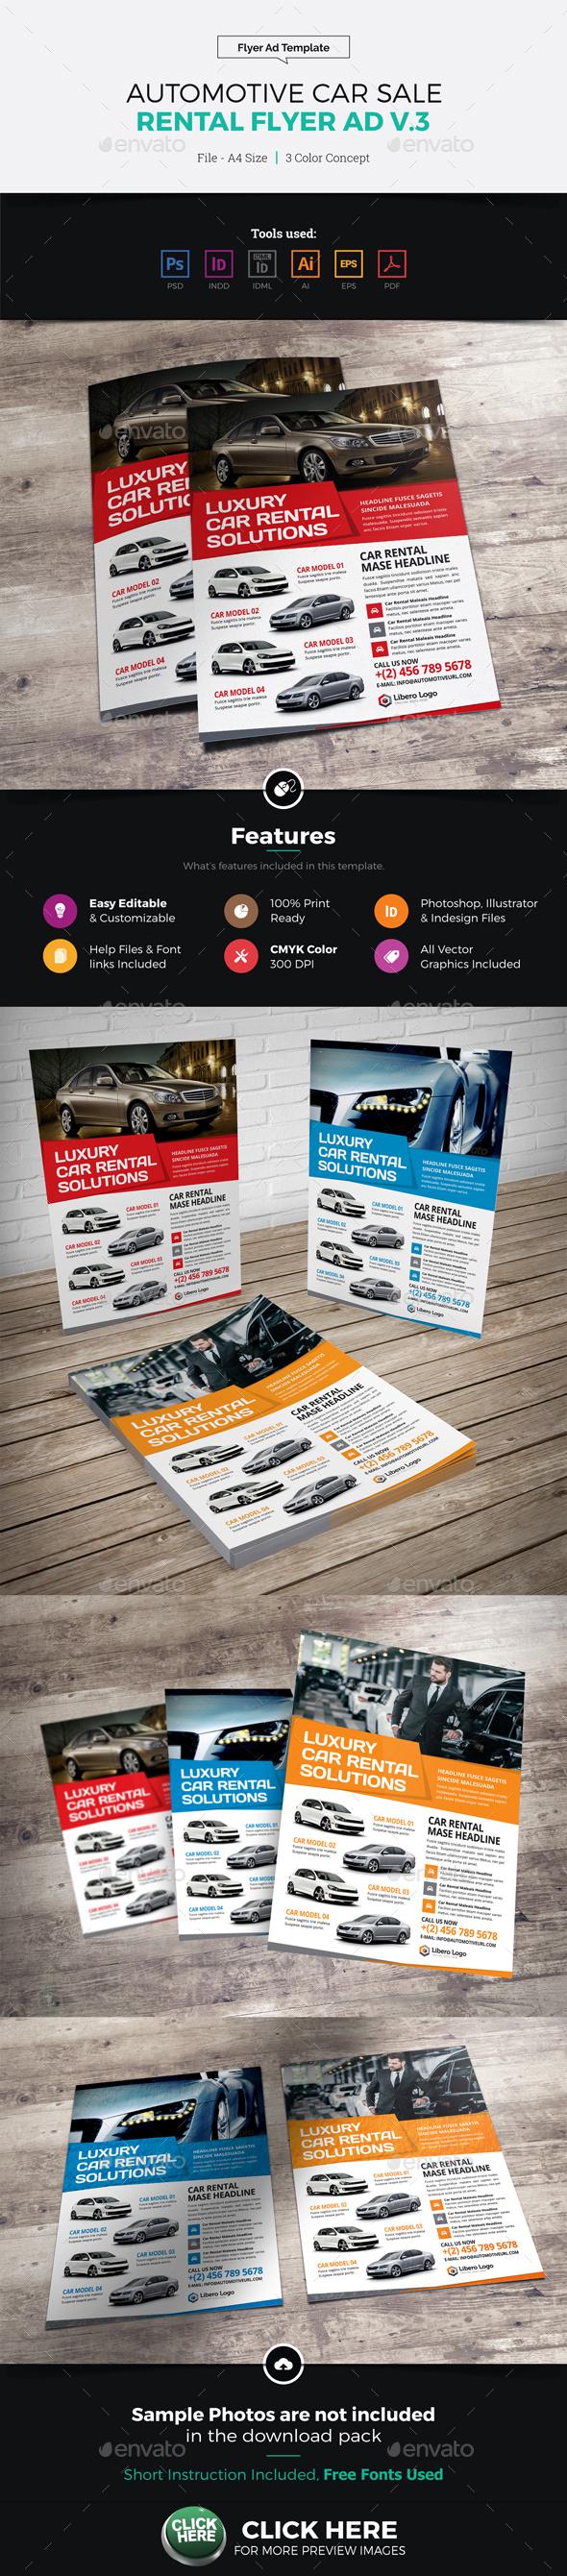 Automotive Car Sale Rental Flyer Ad v3 - Corporate Flyers